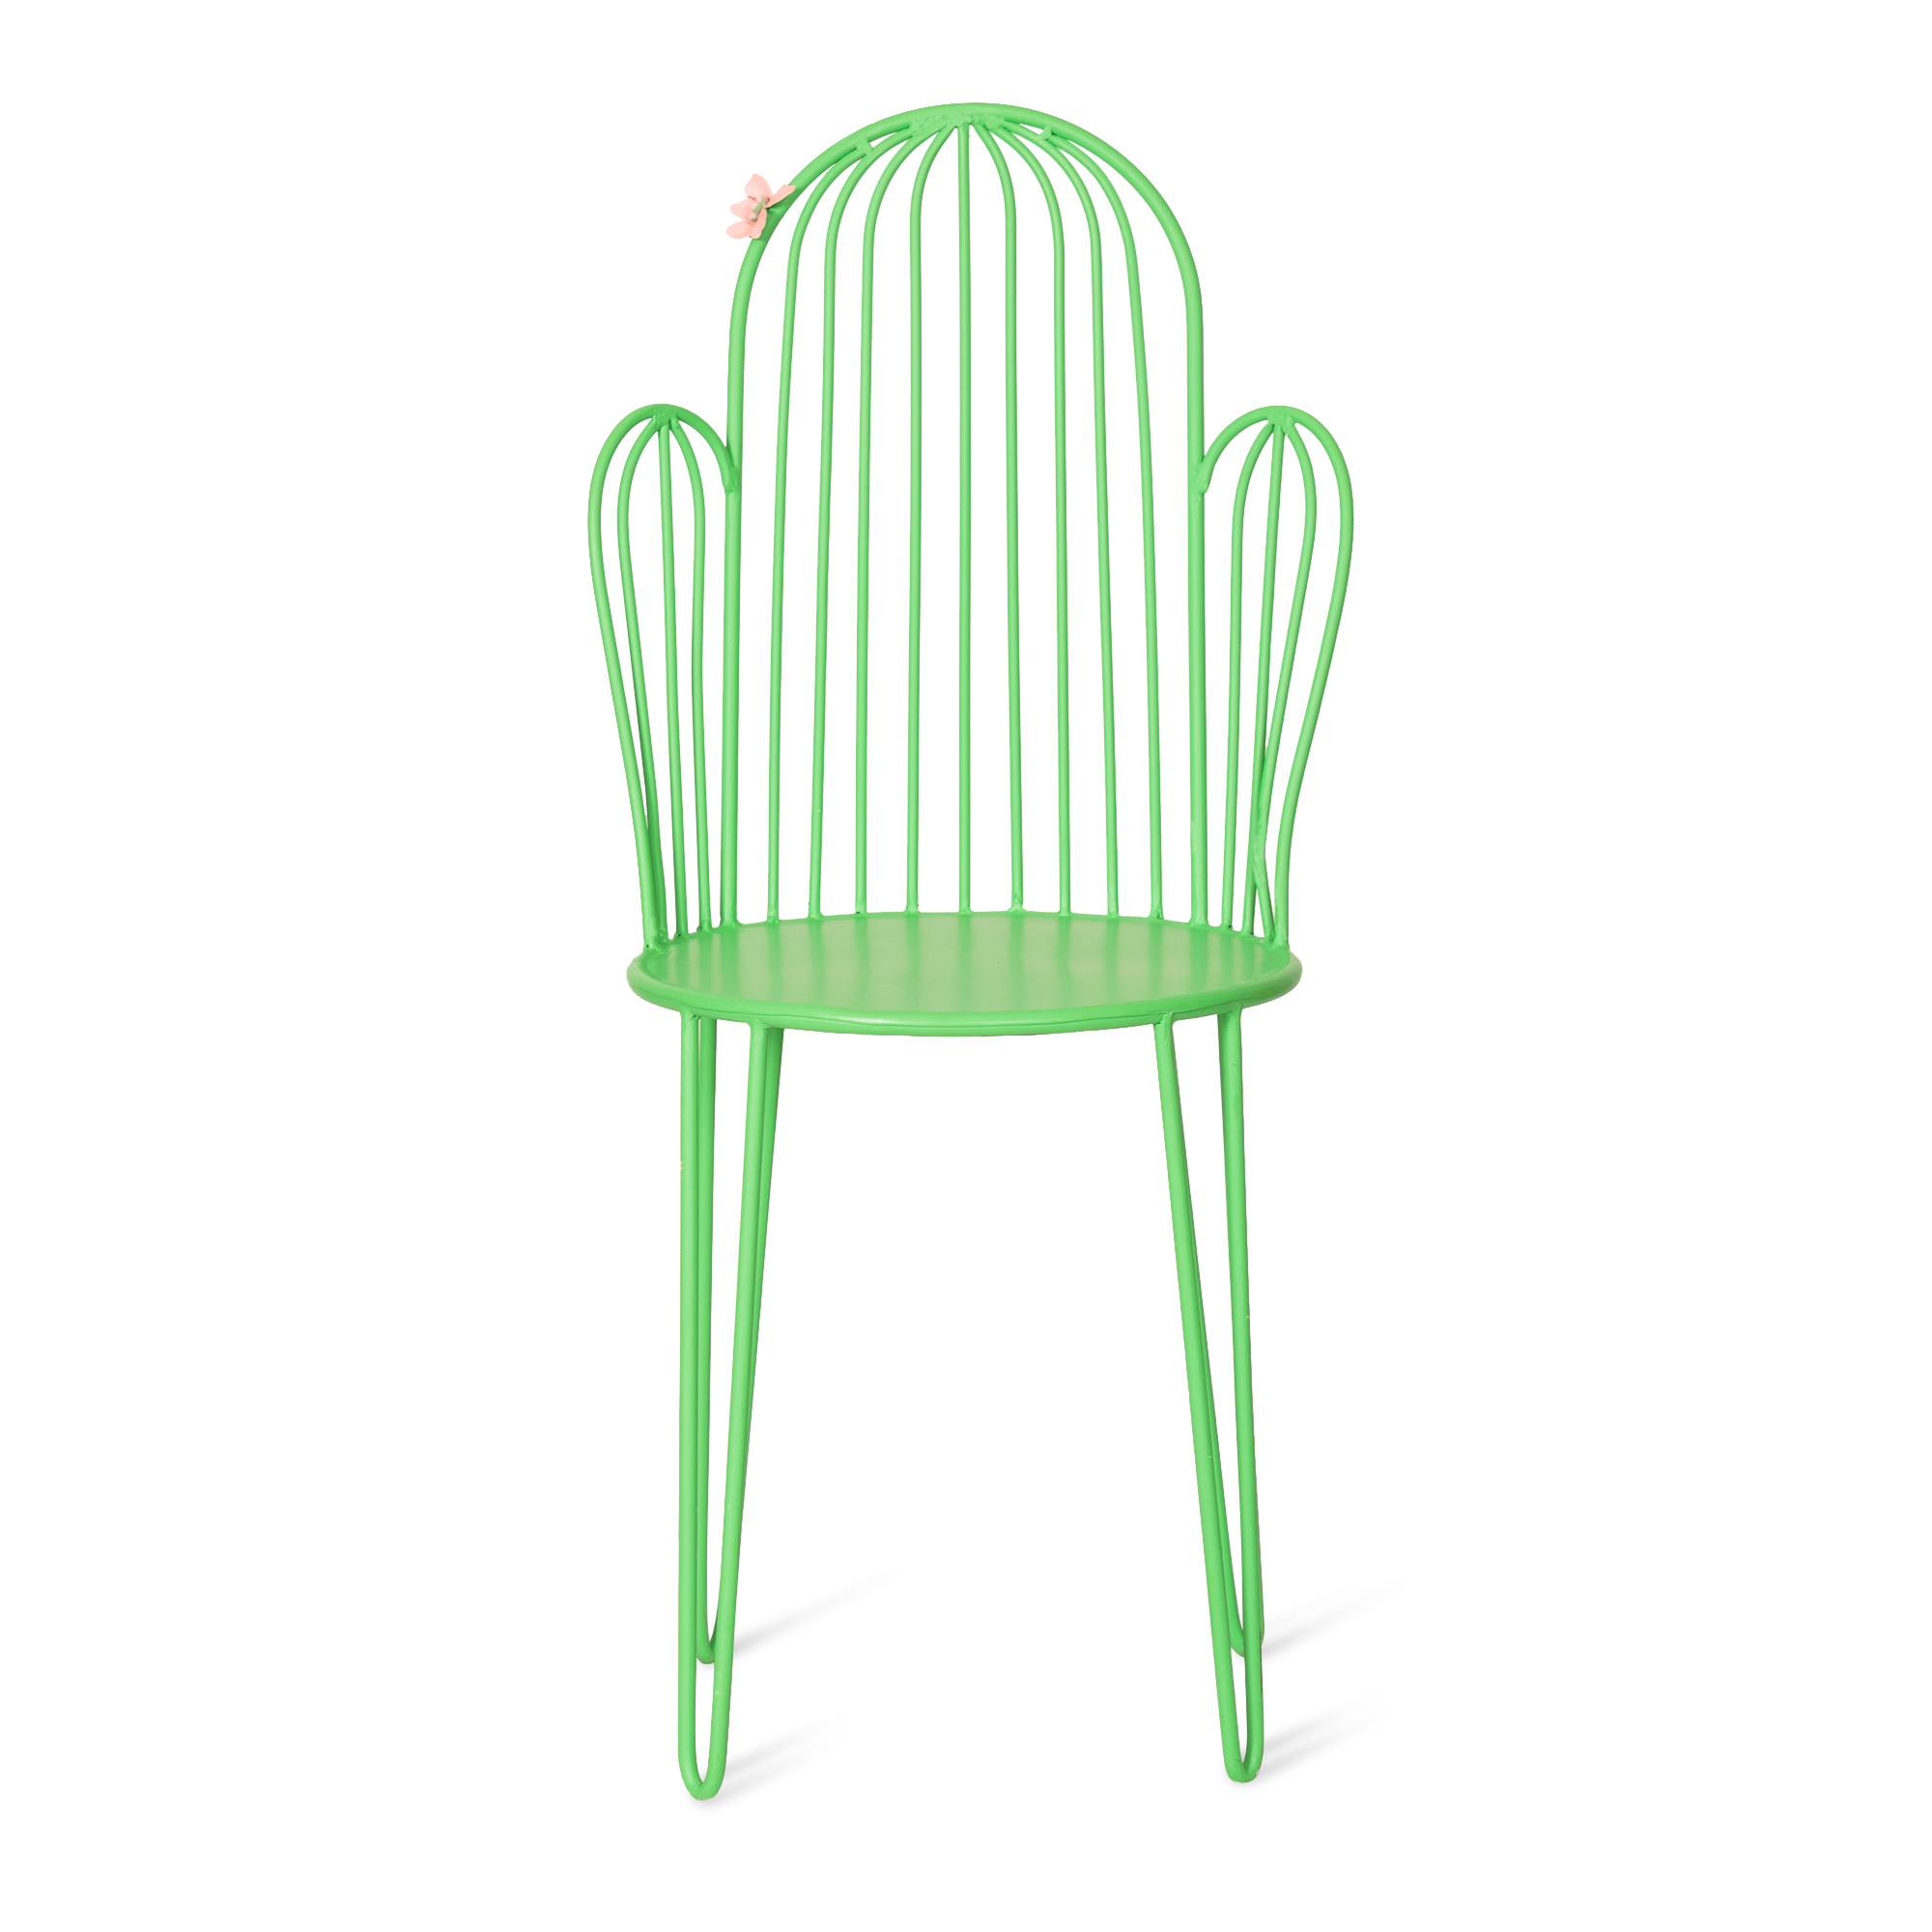 Green Green Cactus Chair